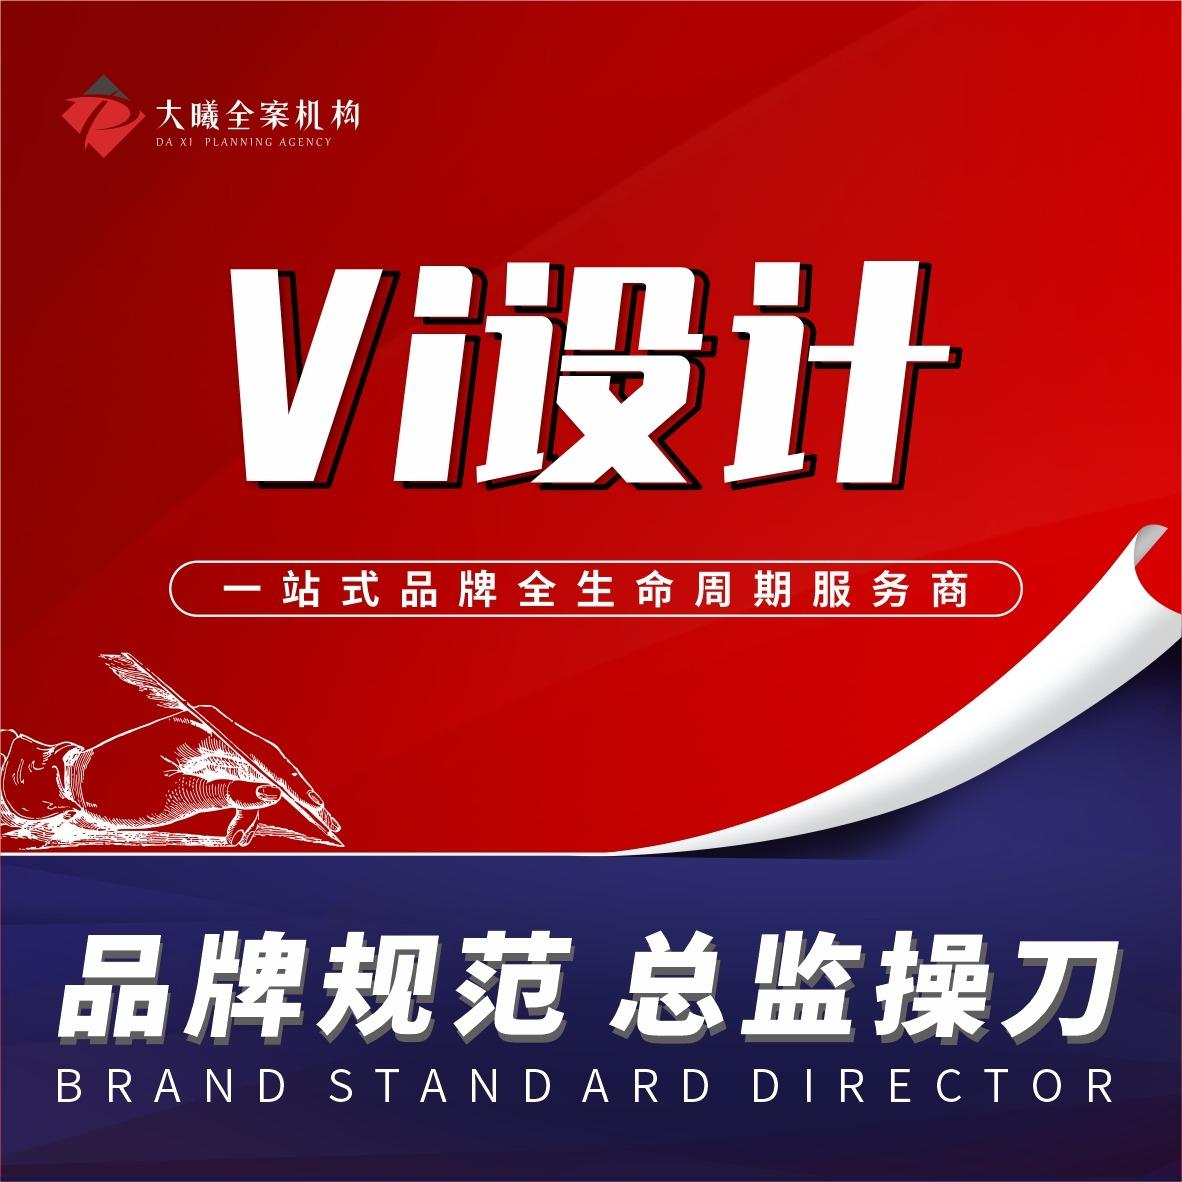 VI设计餐饮教育品牌产品LOGOlogoVI视觉系统VIS